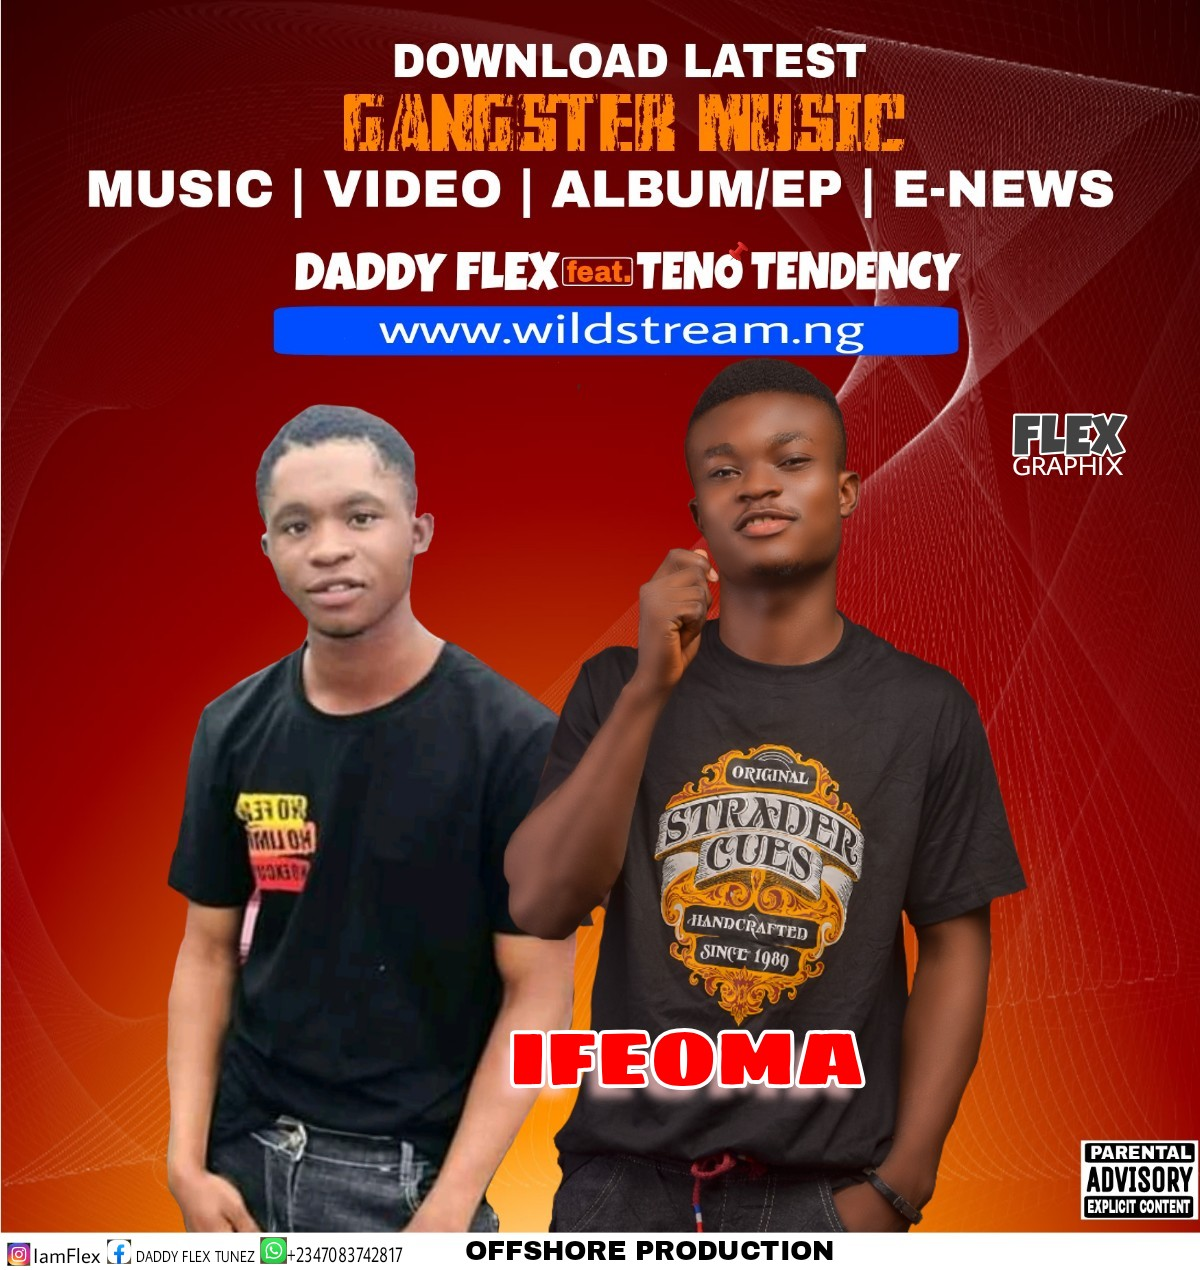 Daddy Flex - Ifeoma (feat. Vcee Teno)